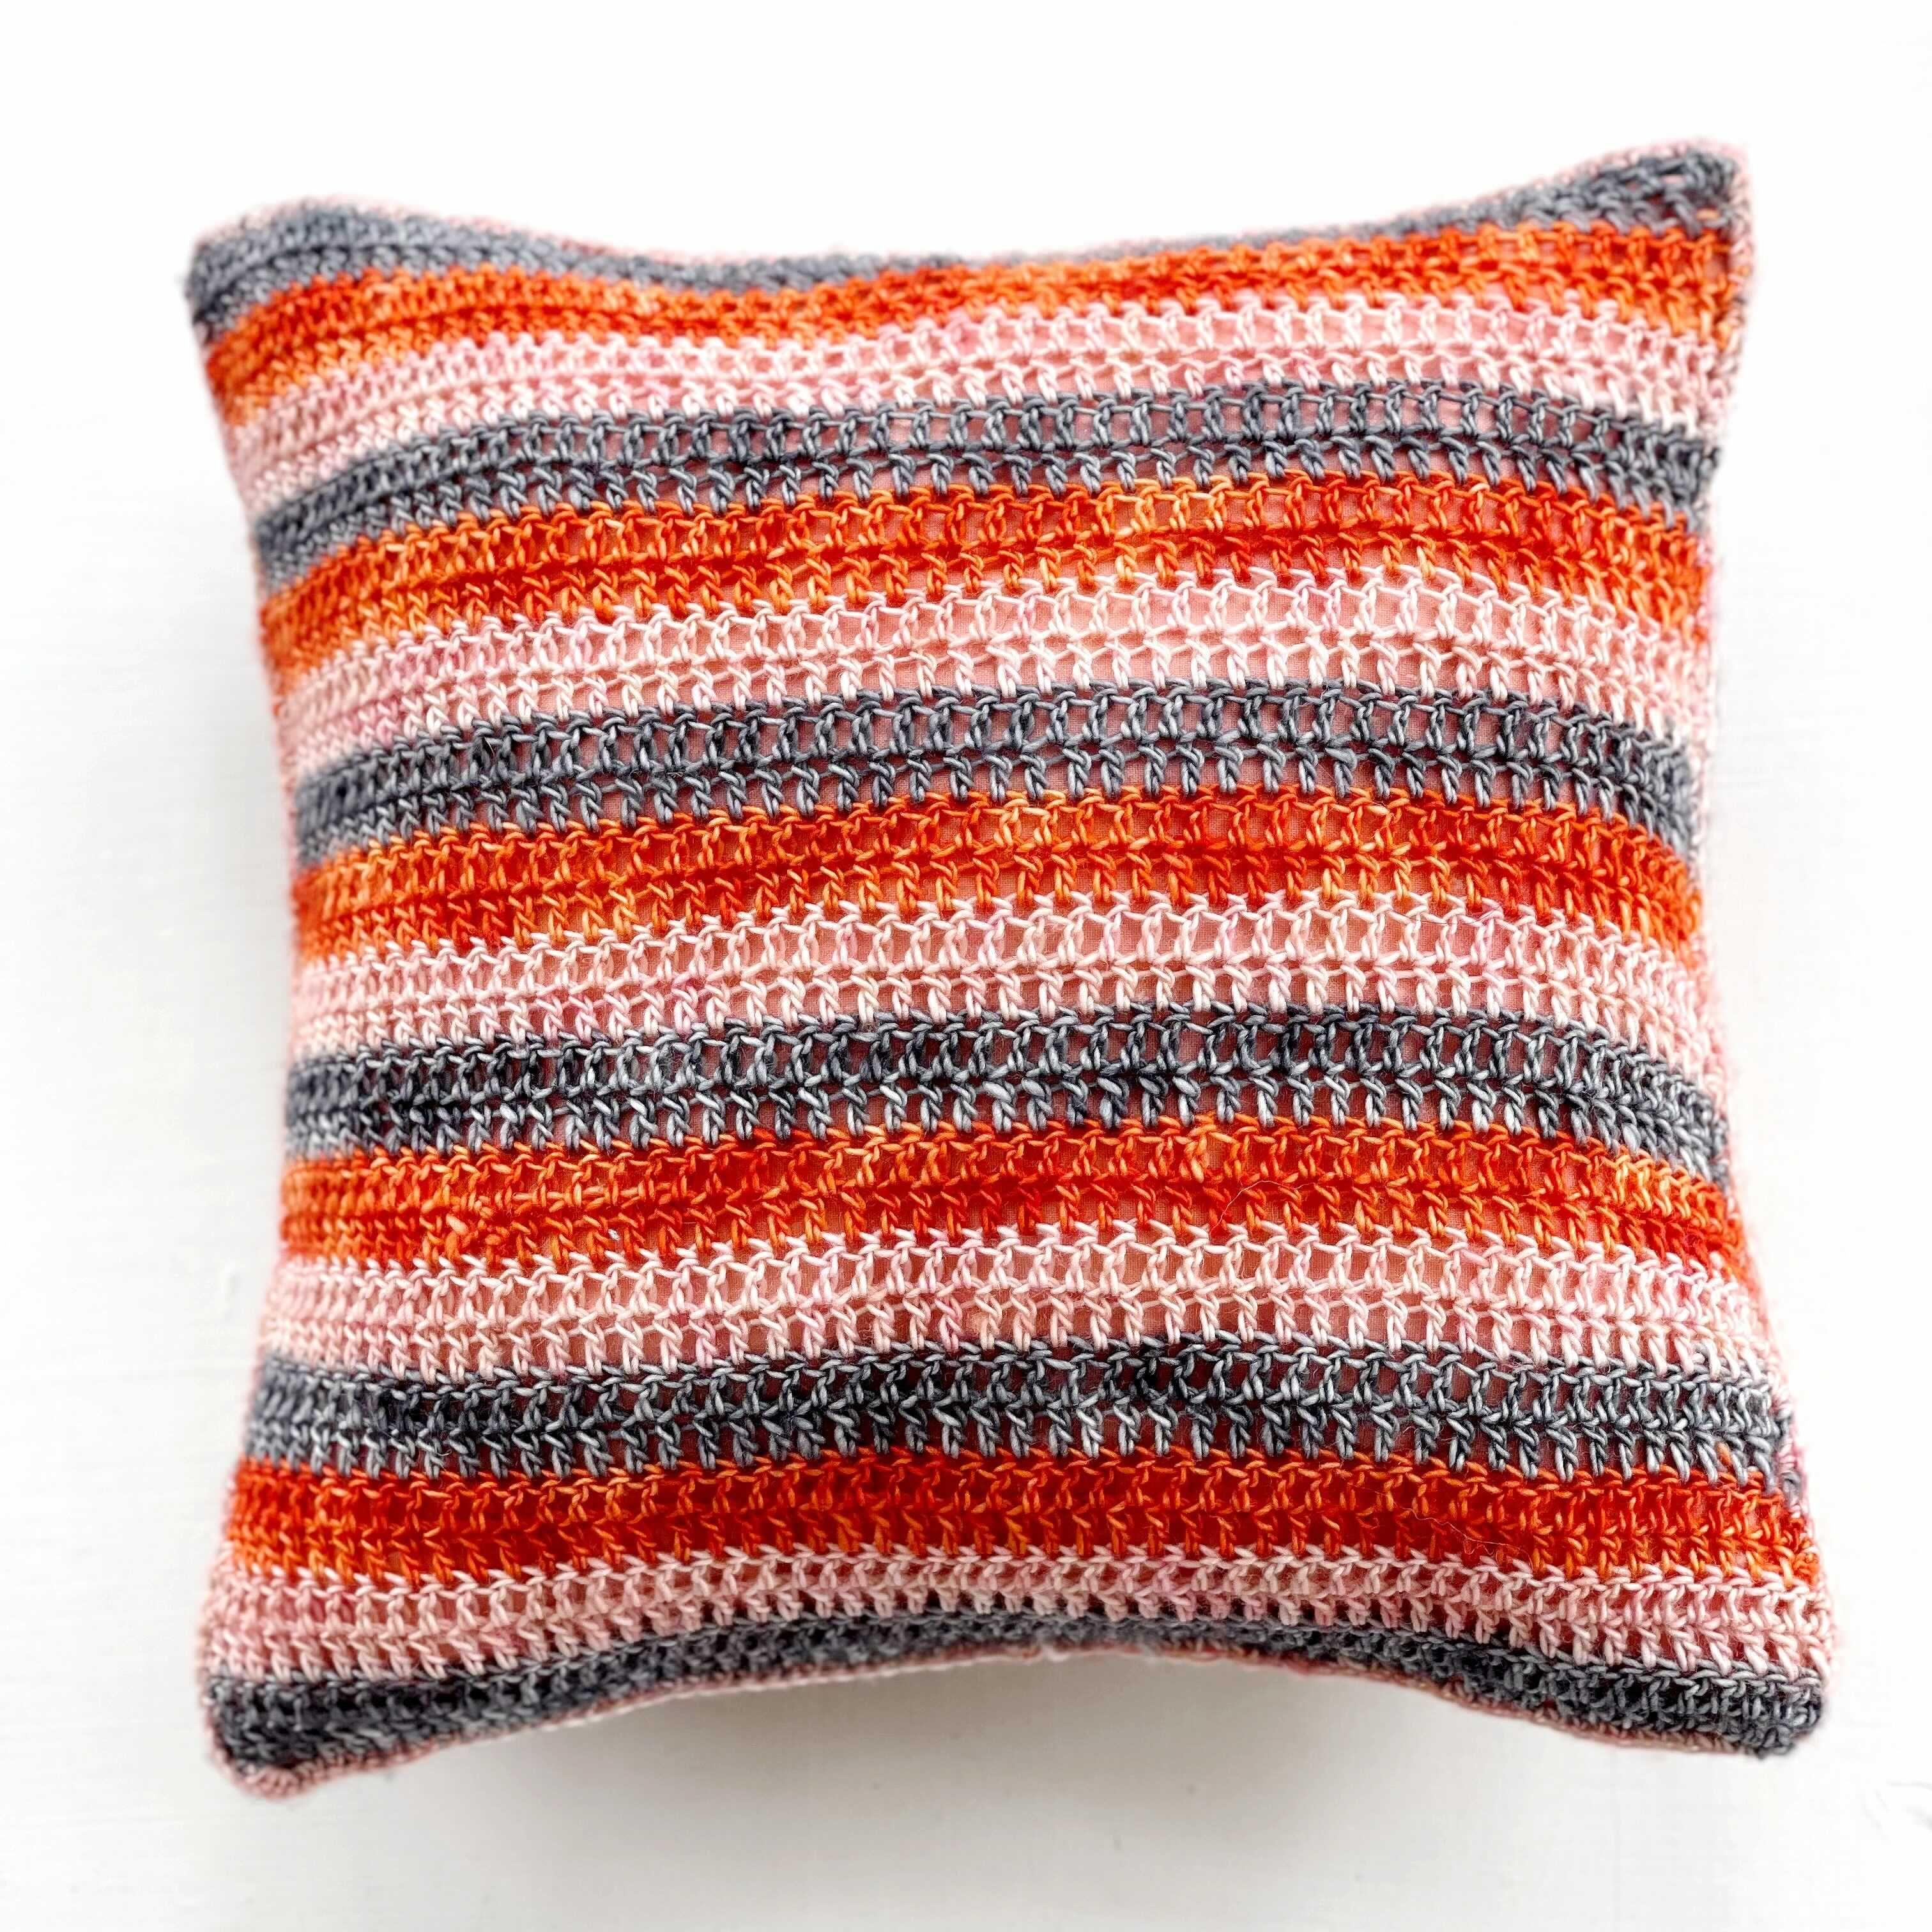 Get the Hip Granny Crochet Pillow Pattern